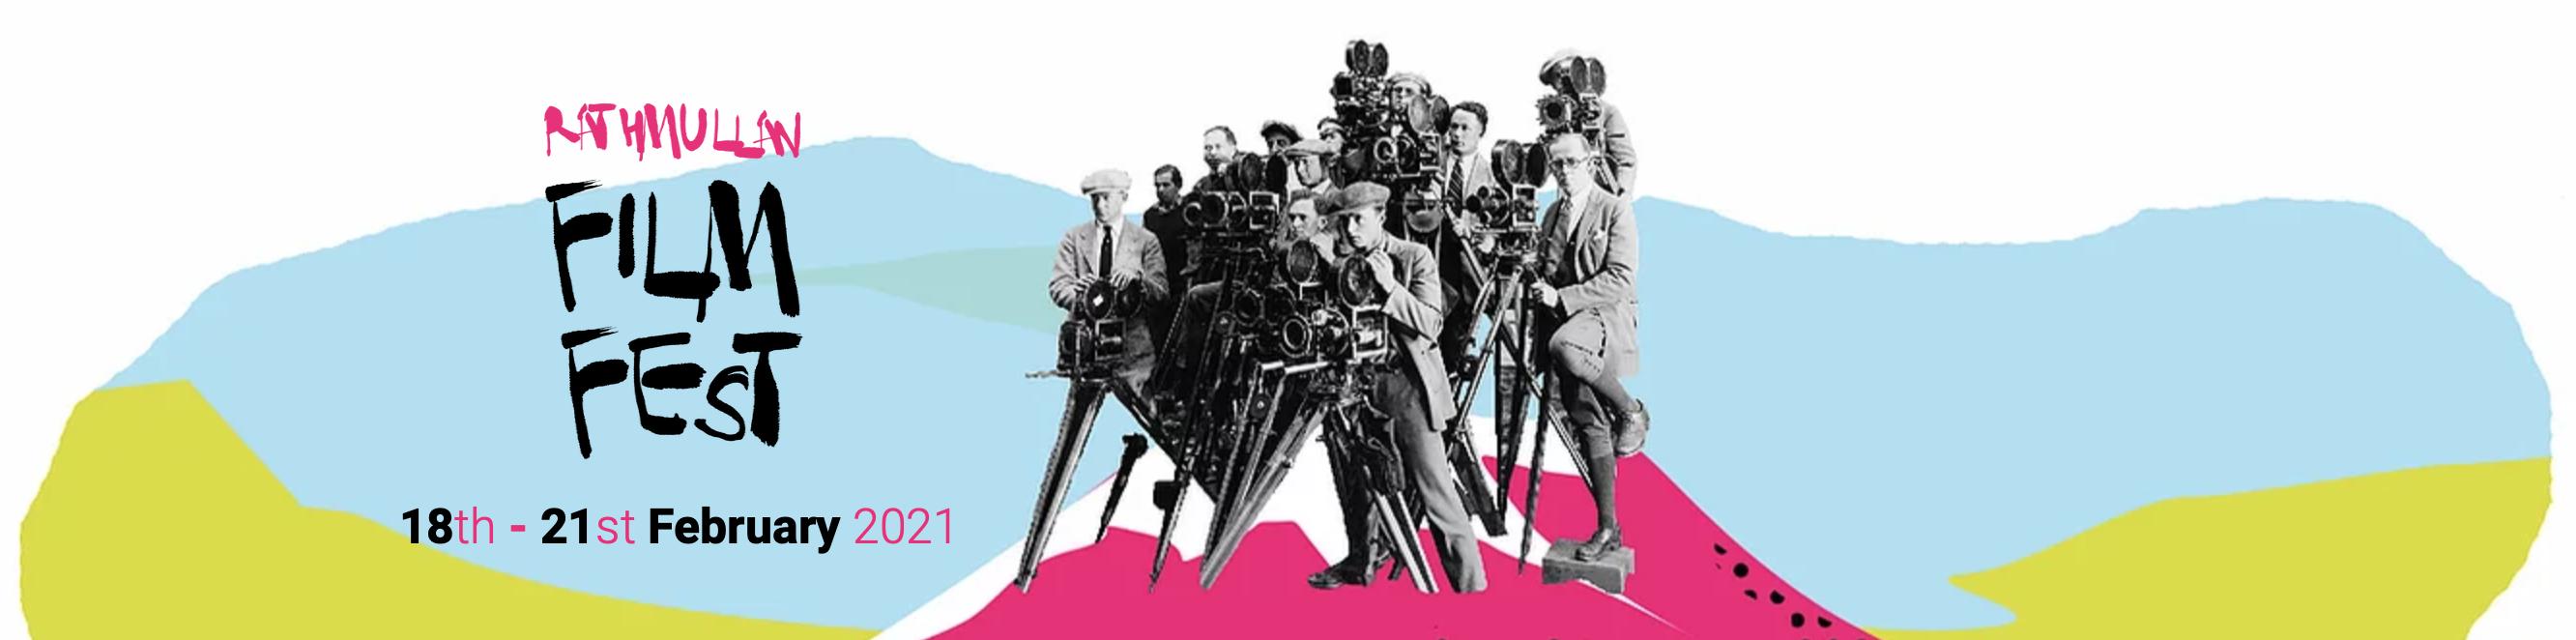 Rathmullan Film Festival